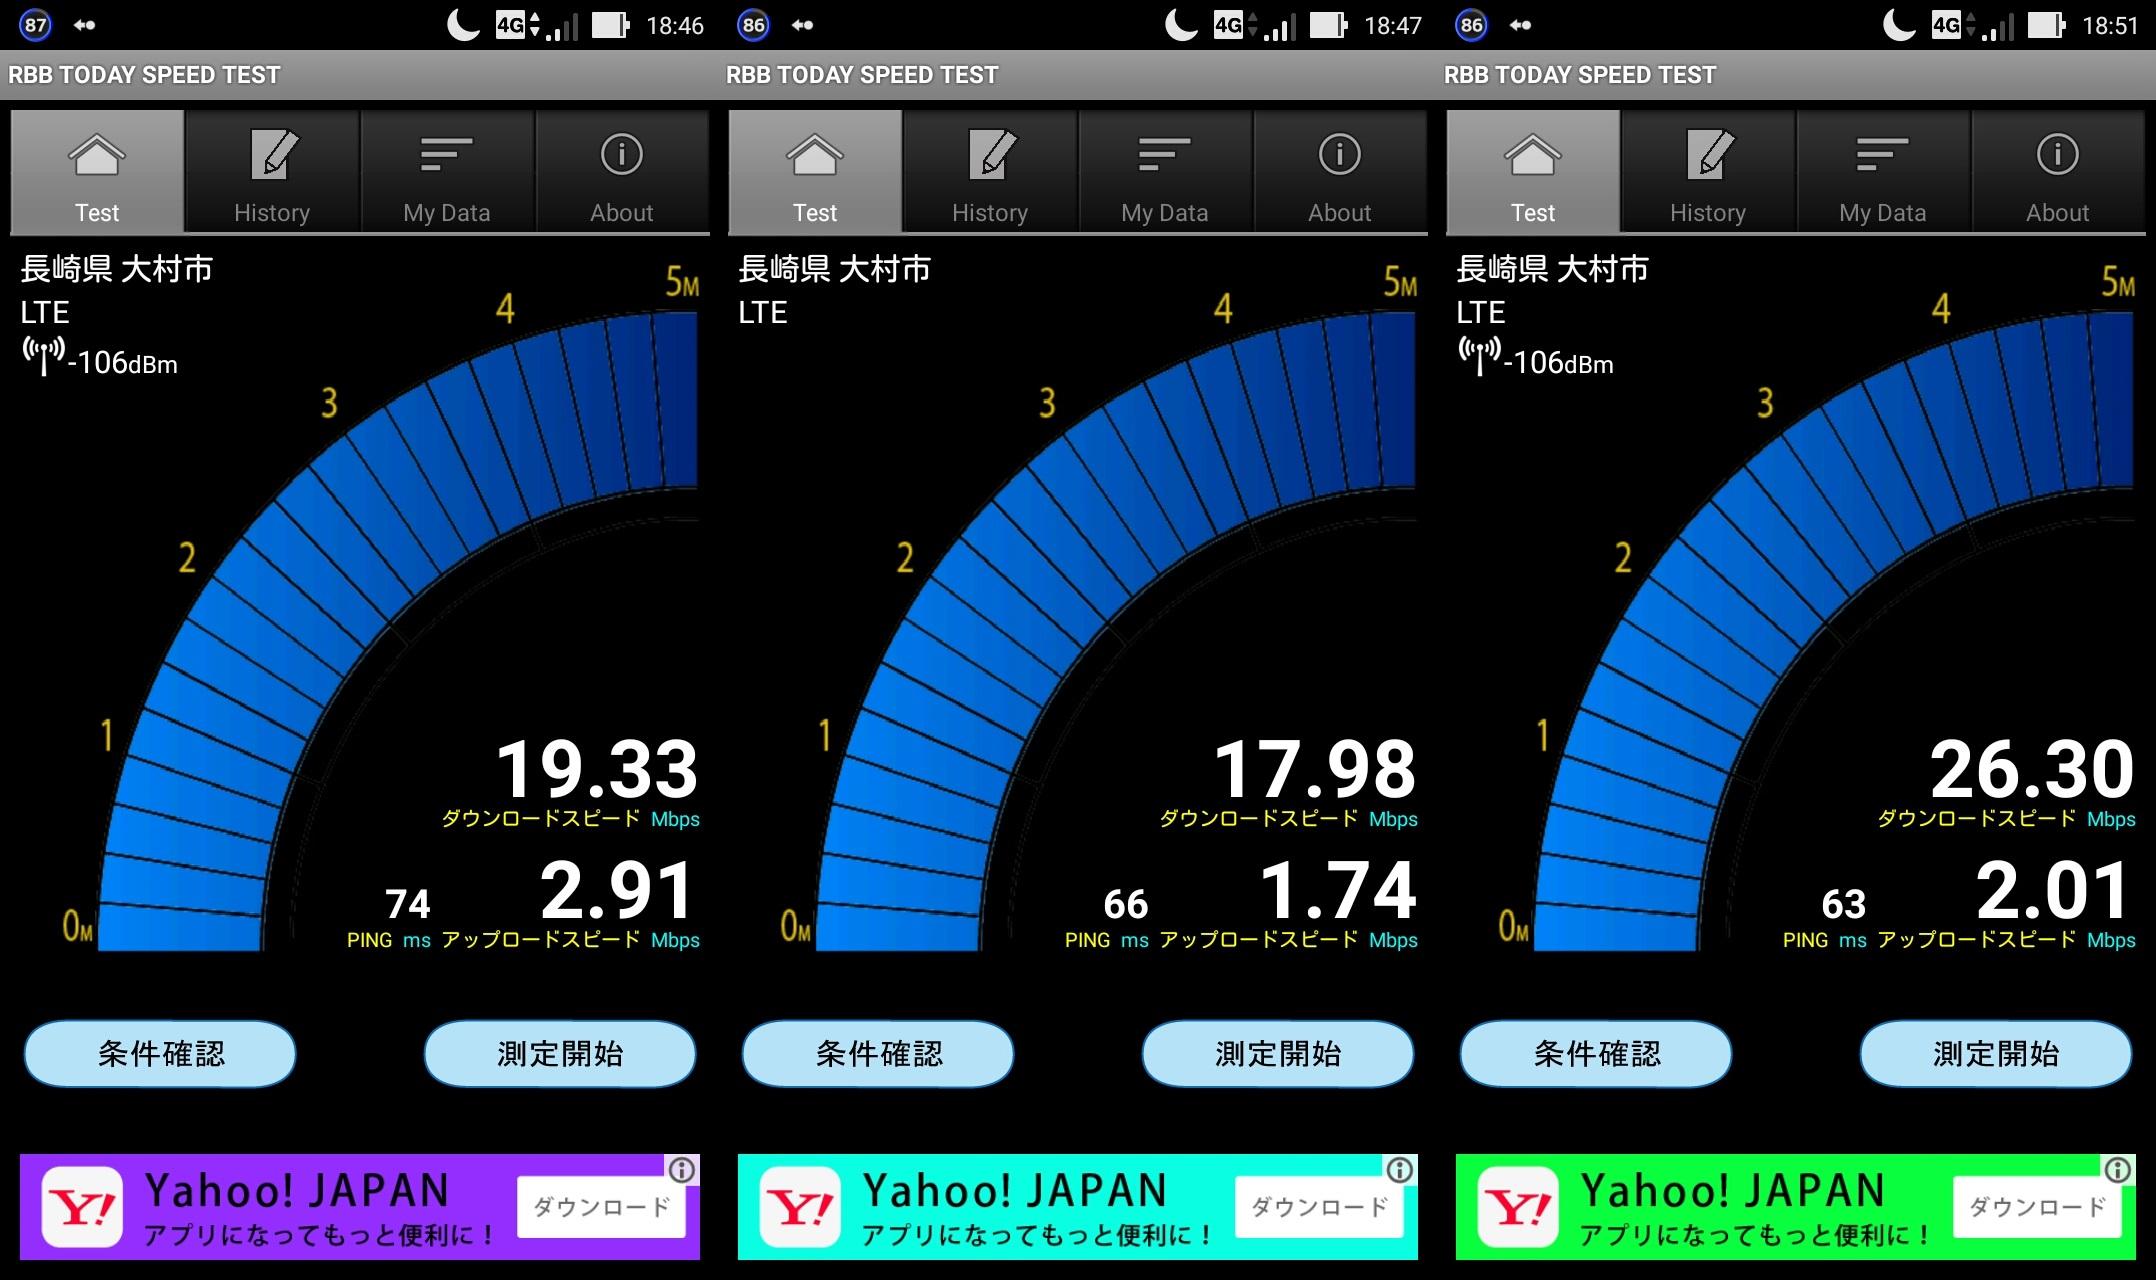 Screenshot_2015-10-05-18-46-51